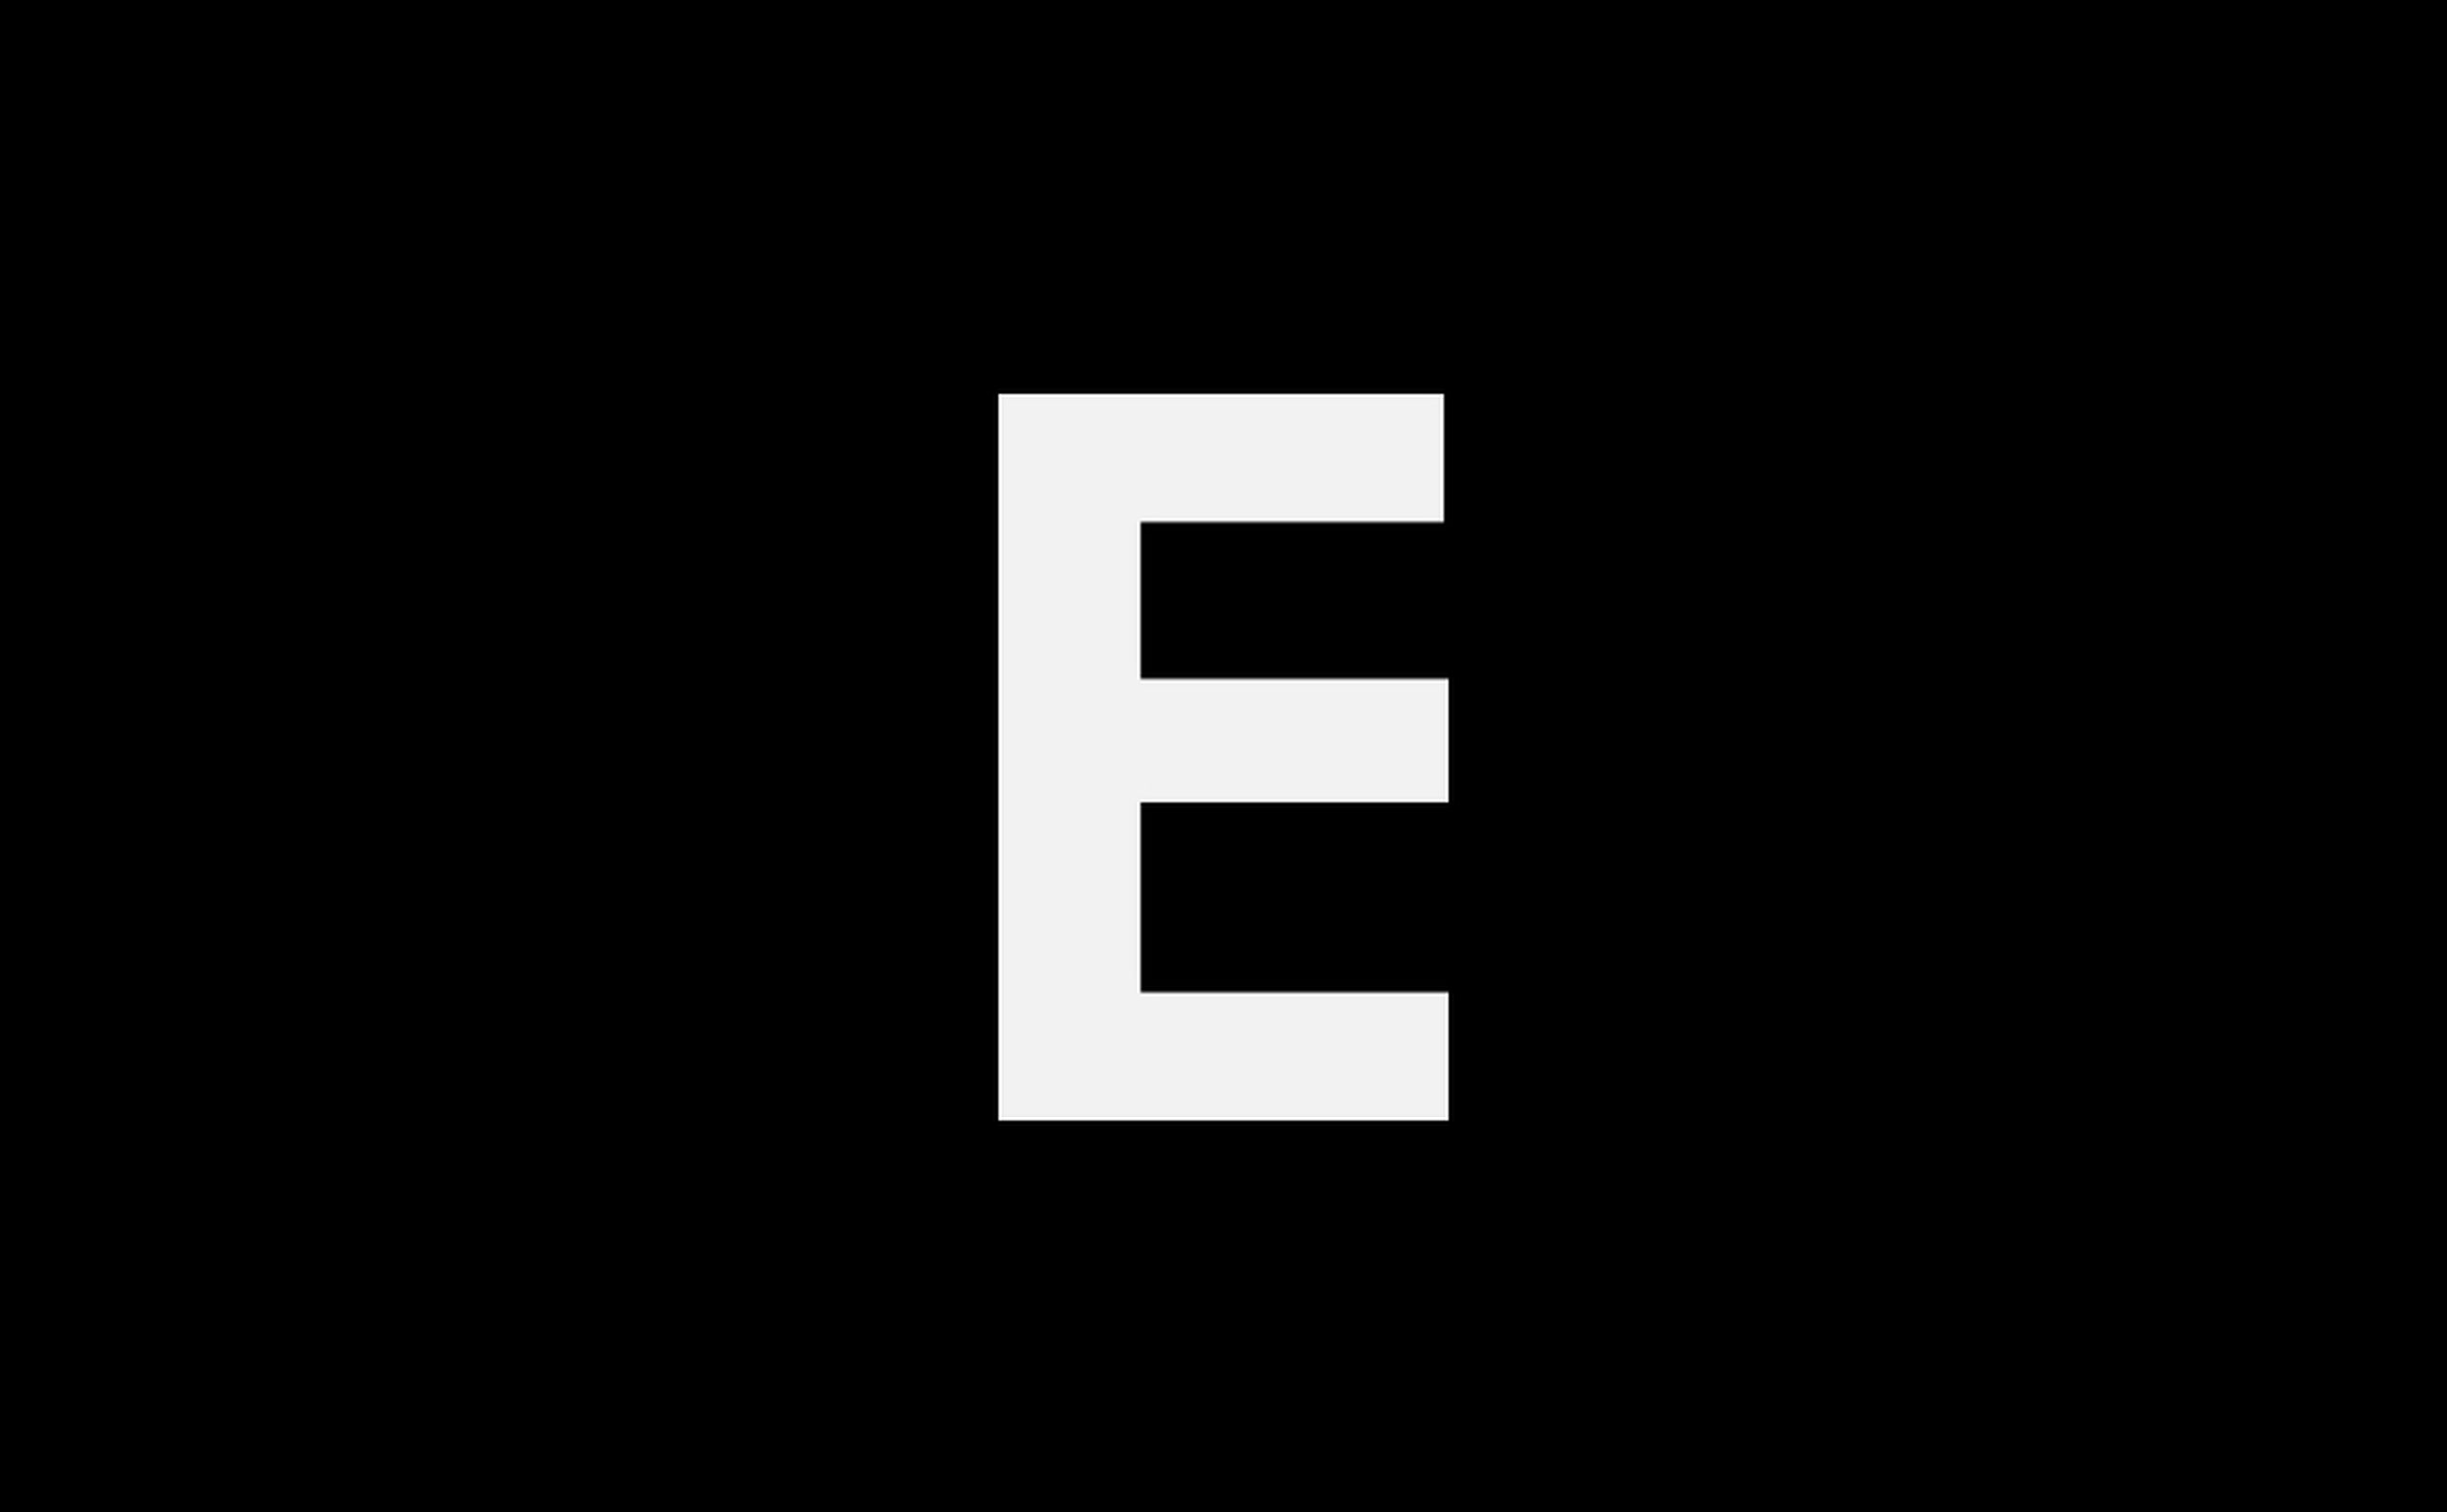 PEOPLE WALKING ON MODERN GLASS BUILDING